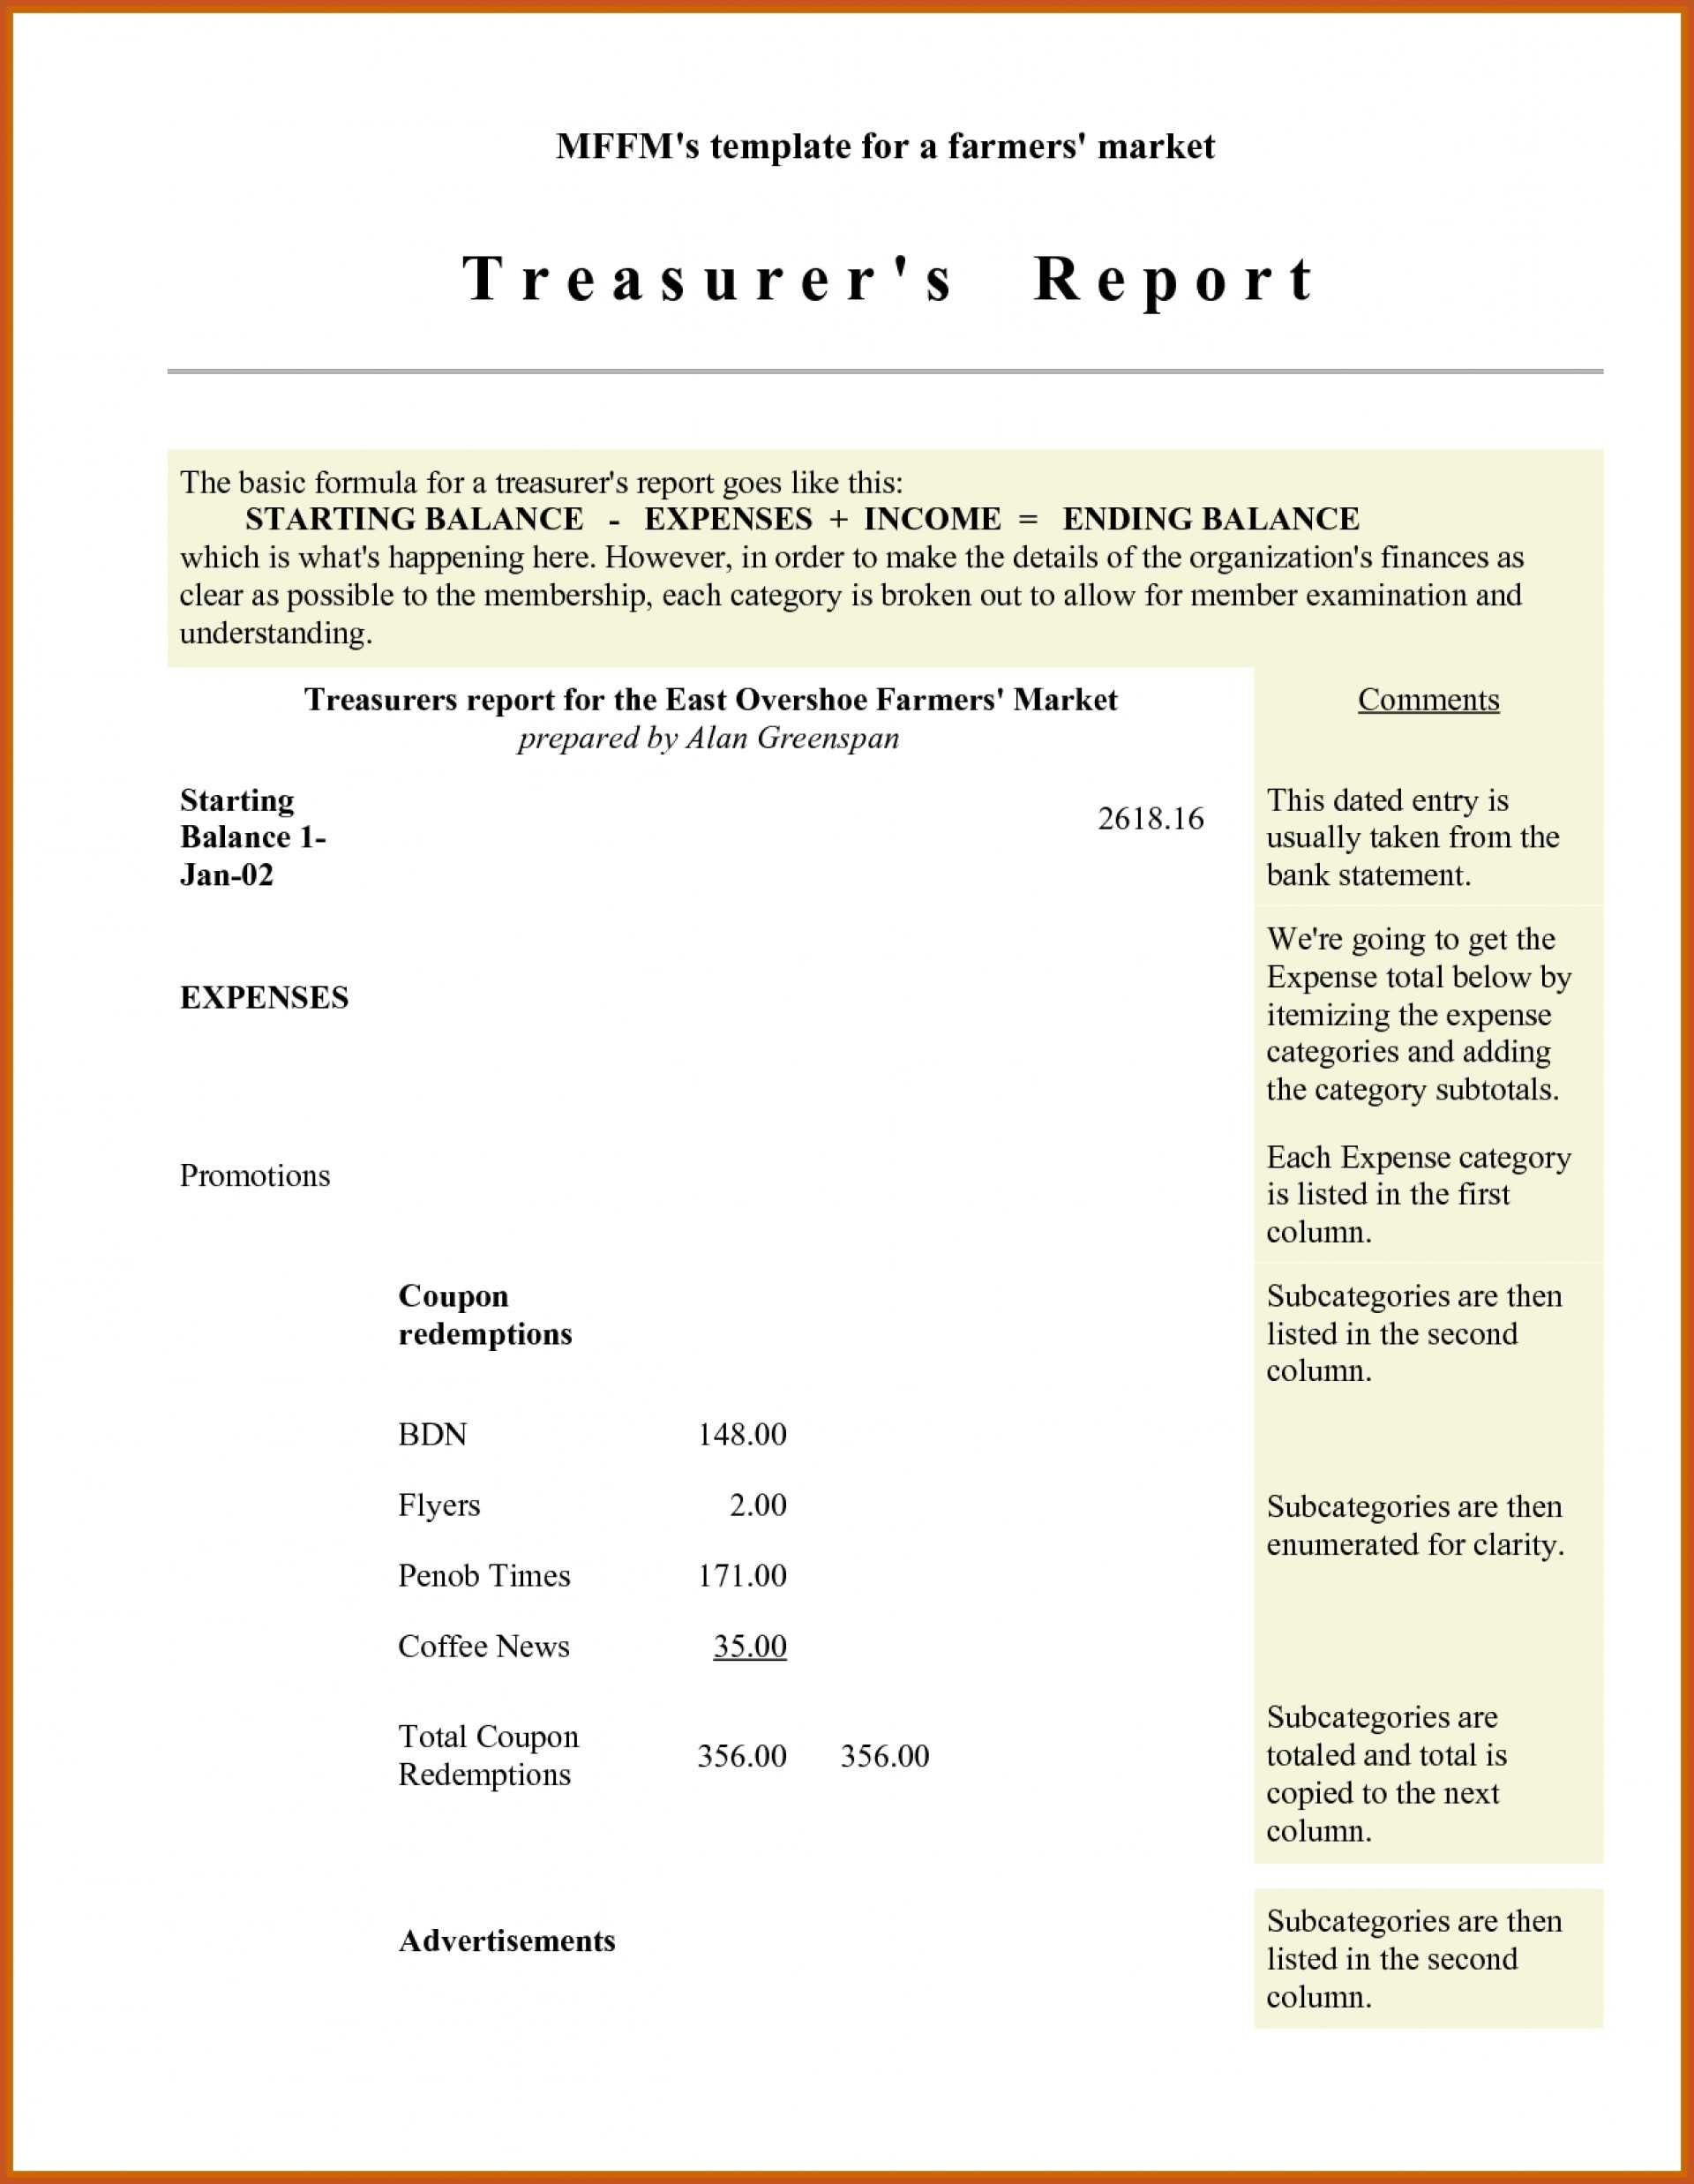 003 Treasurer Report Template Non Profit Sample Treasurers Within Treasurer Report Template Non Profit